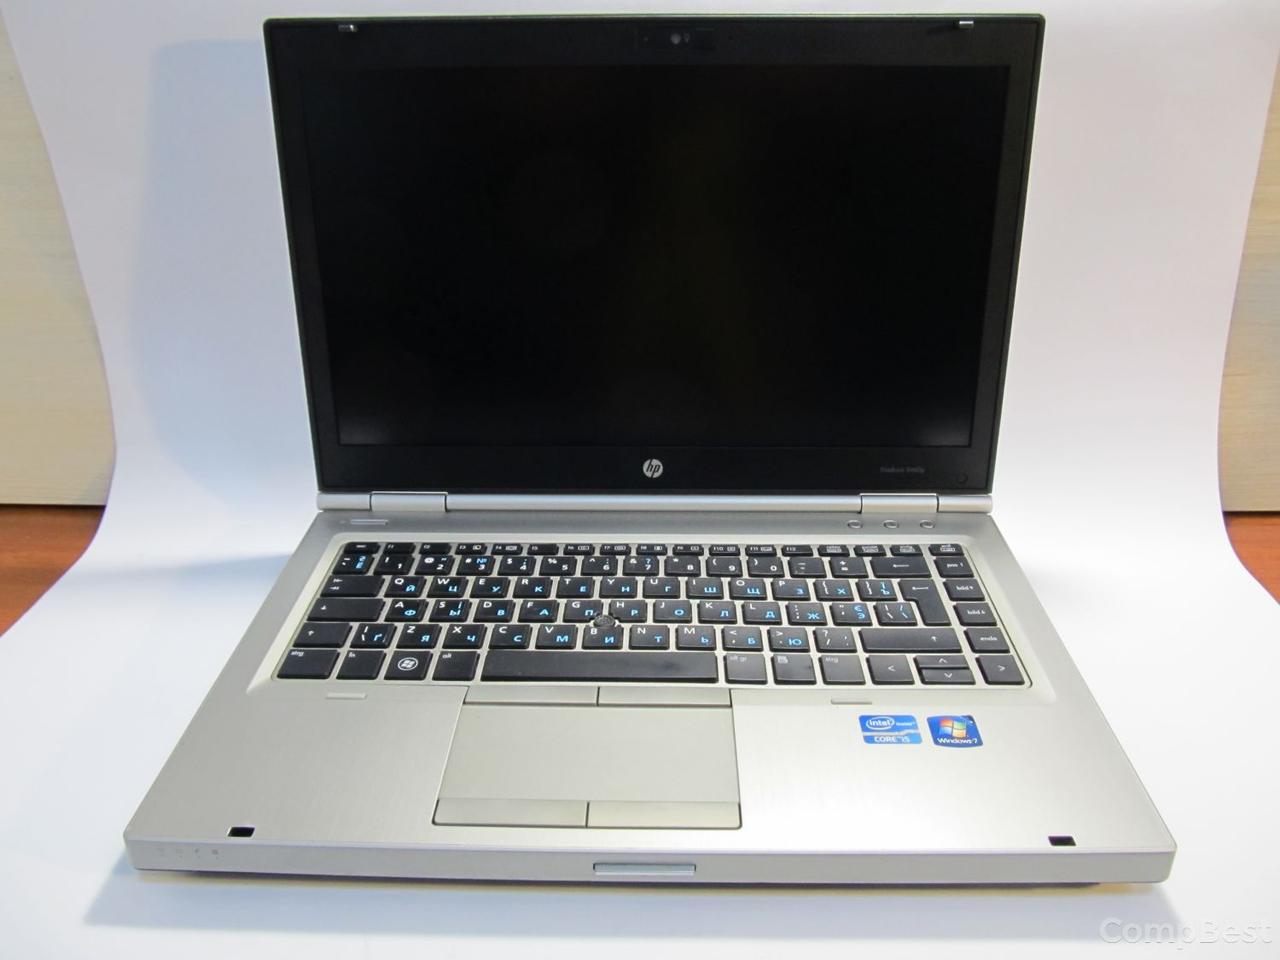 "HP EliteBook 8460p / 14"" TFT (1600x900) / Intel® Core™ i5-2540M (2 ядра (4 потока) по 2.6 - 3.3 GHz) / 8 GB DDR3 / 320 GB HDD / Wi-Fi, Bluetooth,"